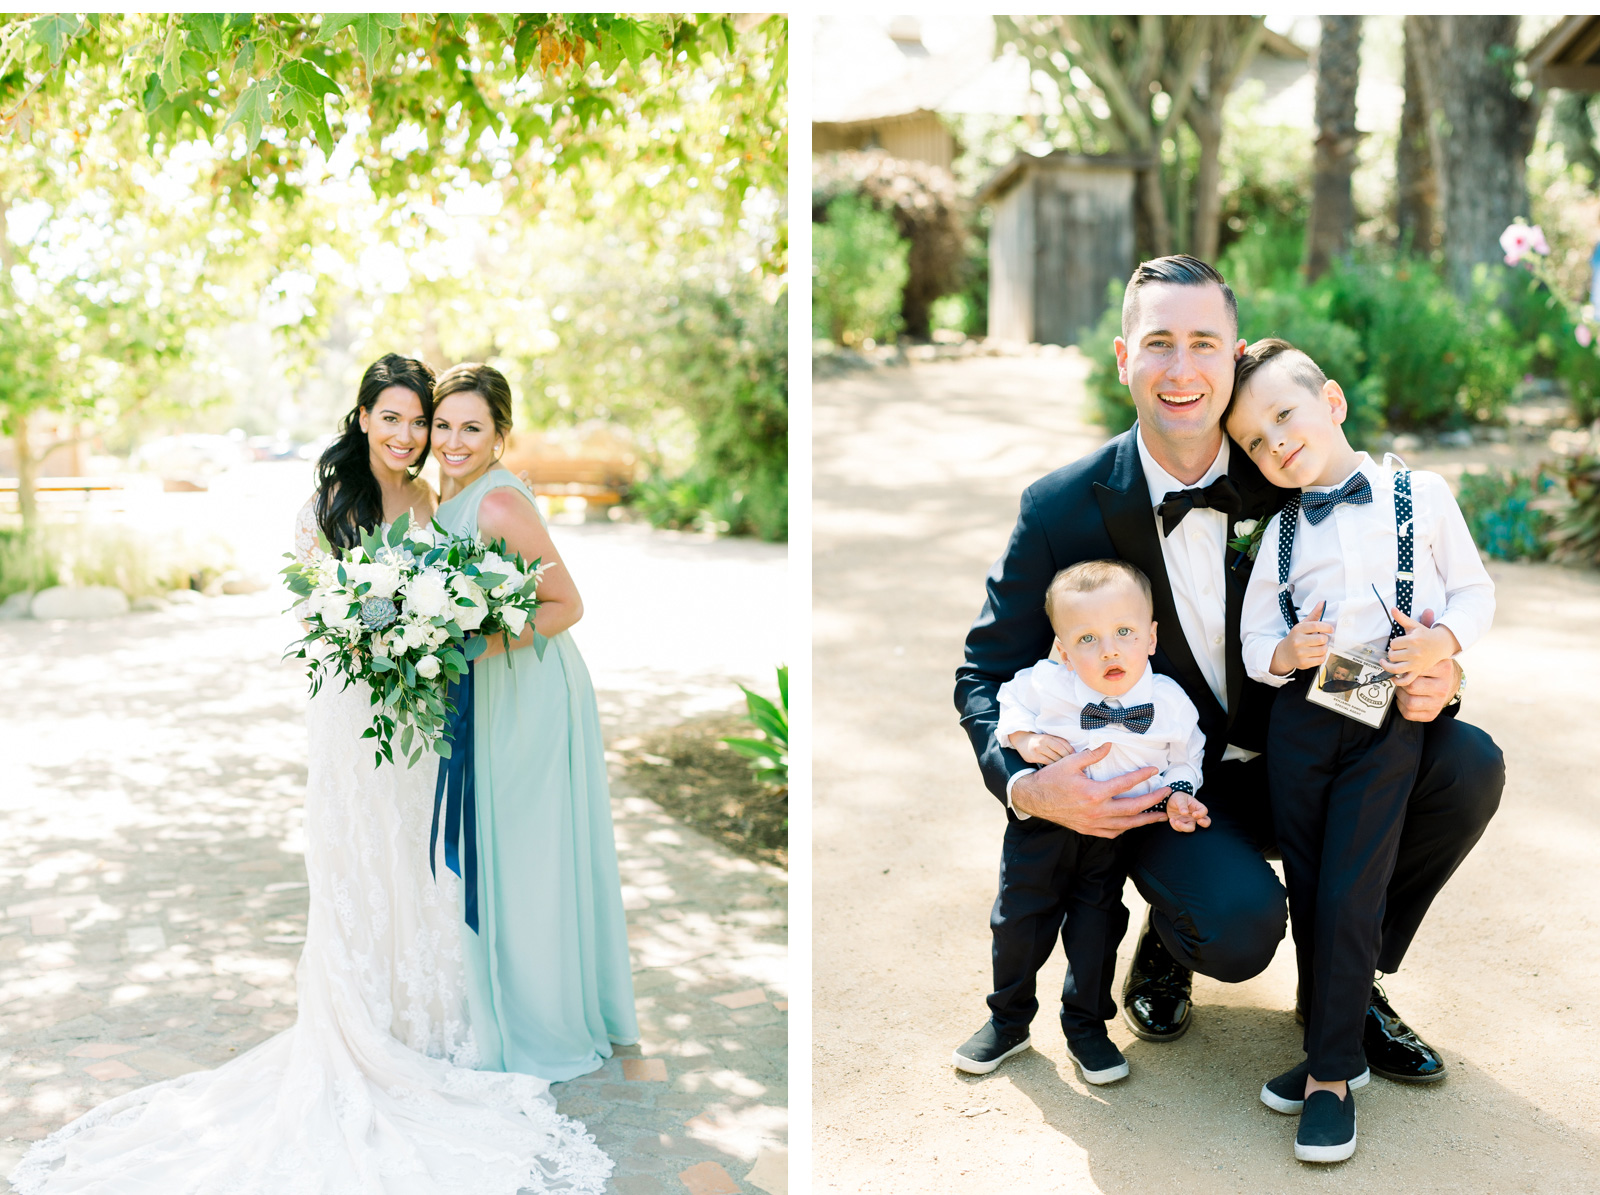 San-Diego-Weddings-Natalie-Schutt-Photography_02.jpg